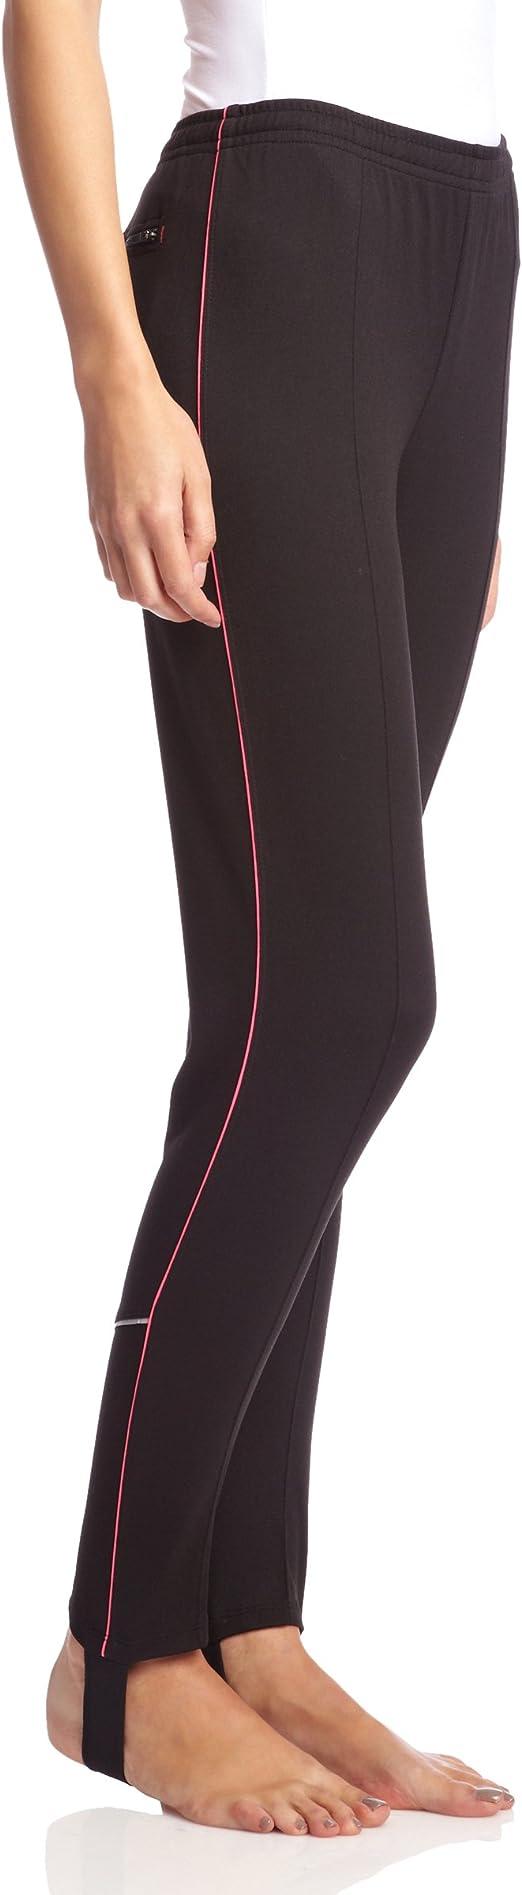 Ronhill - Pantalones de Running para Mujer